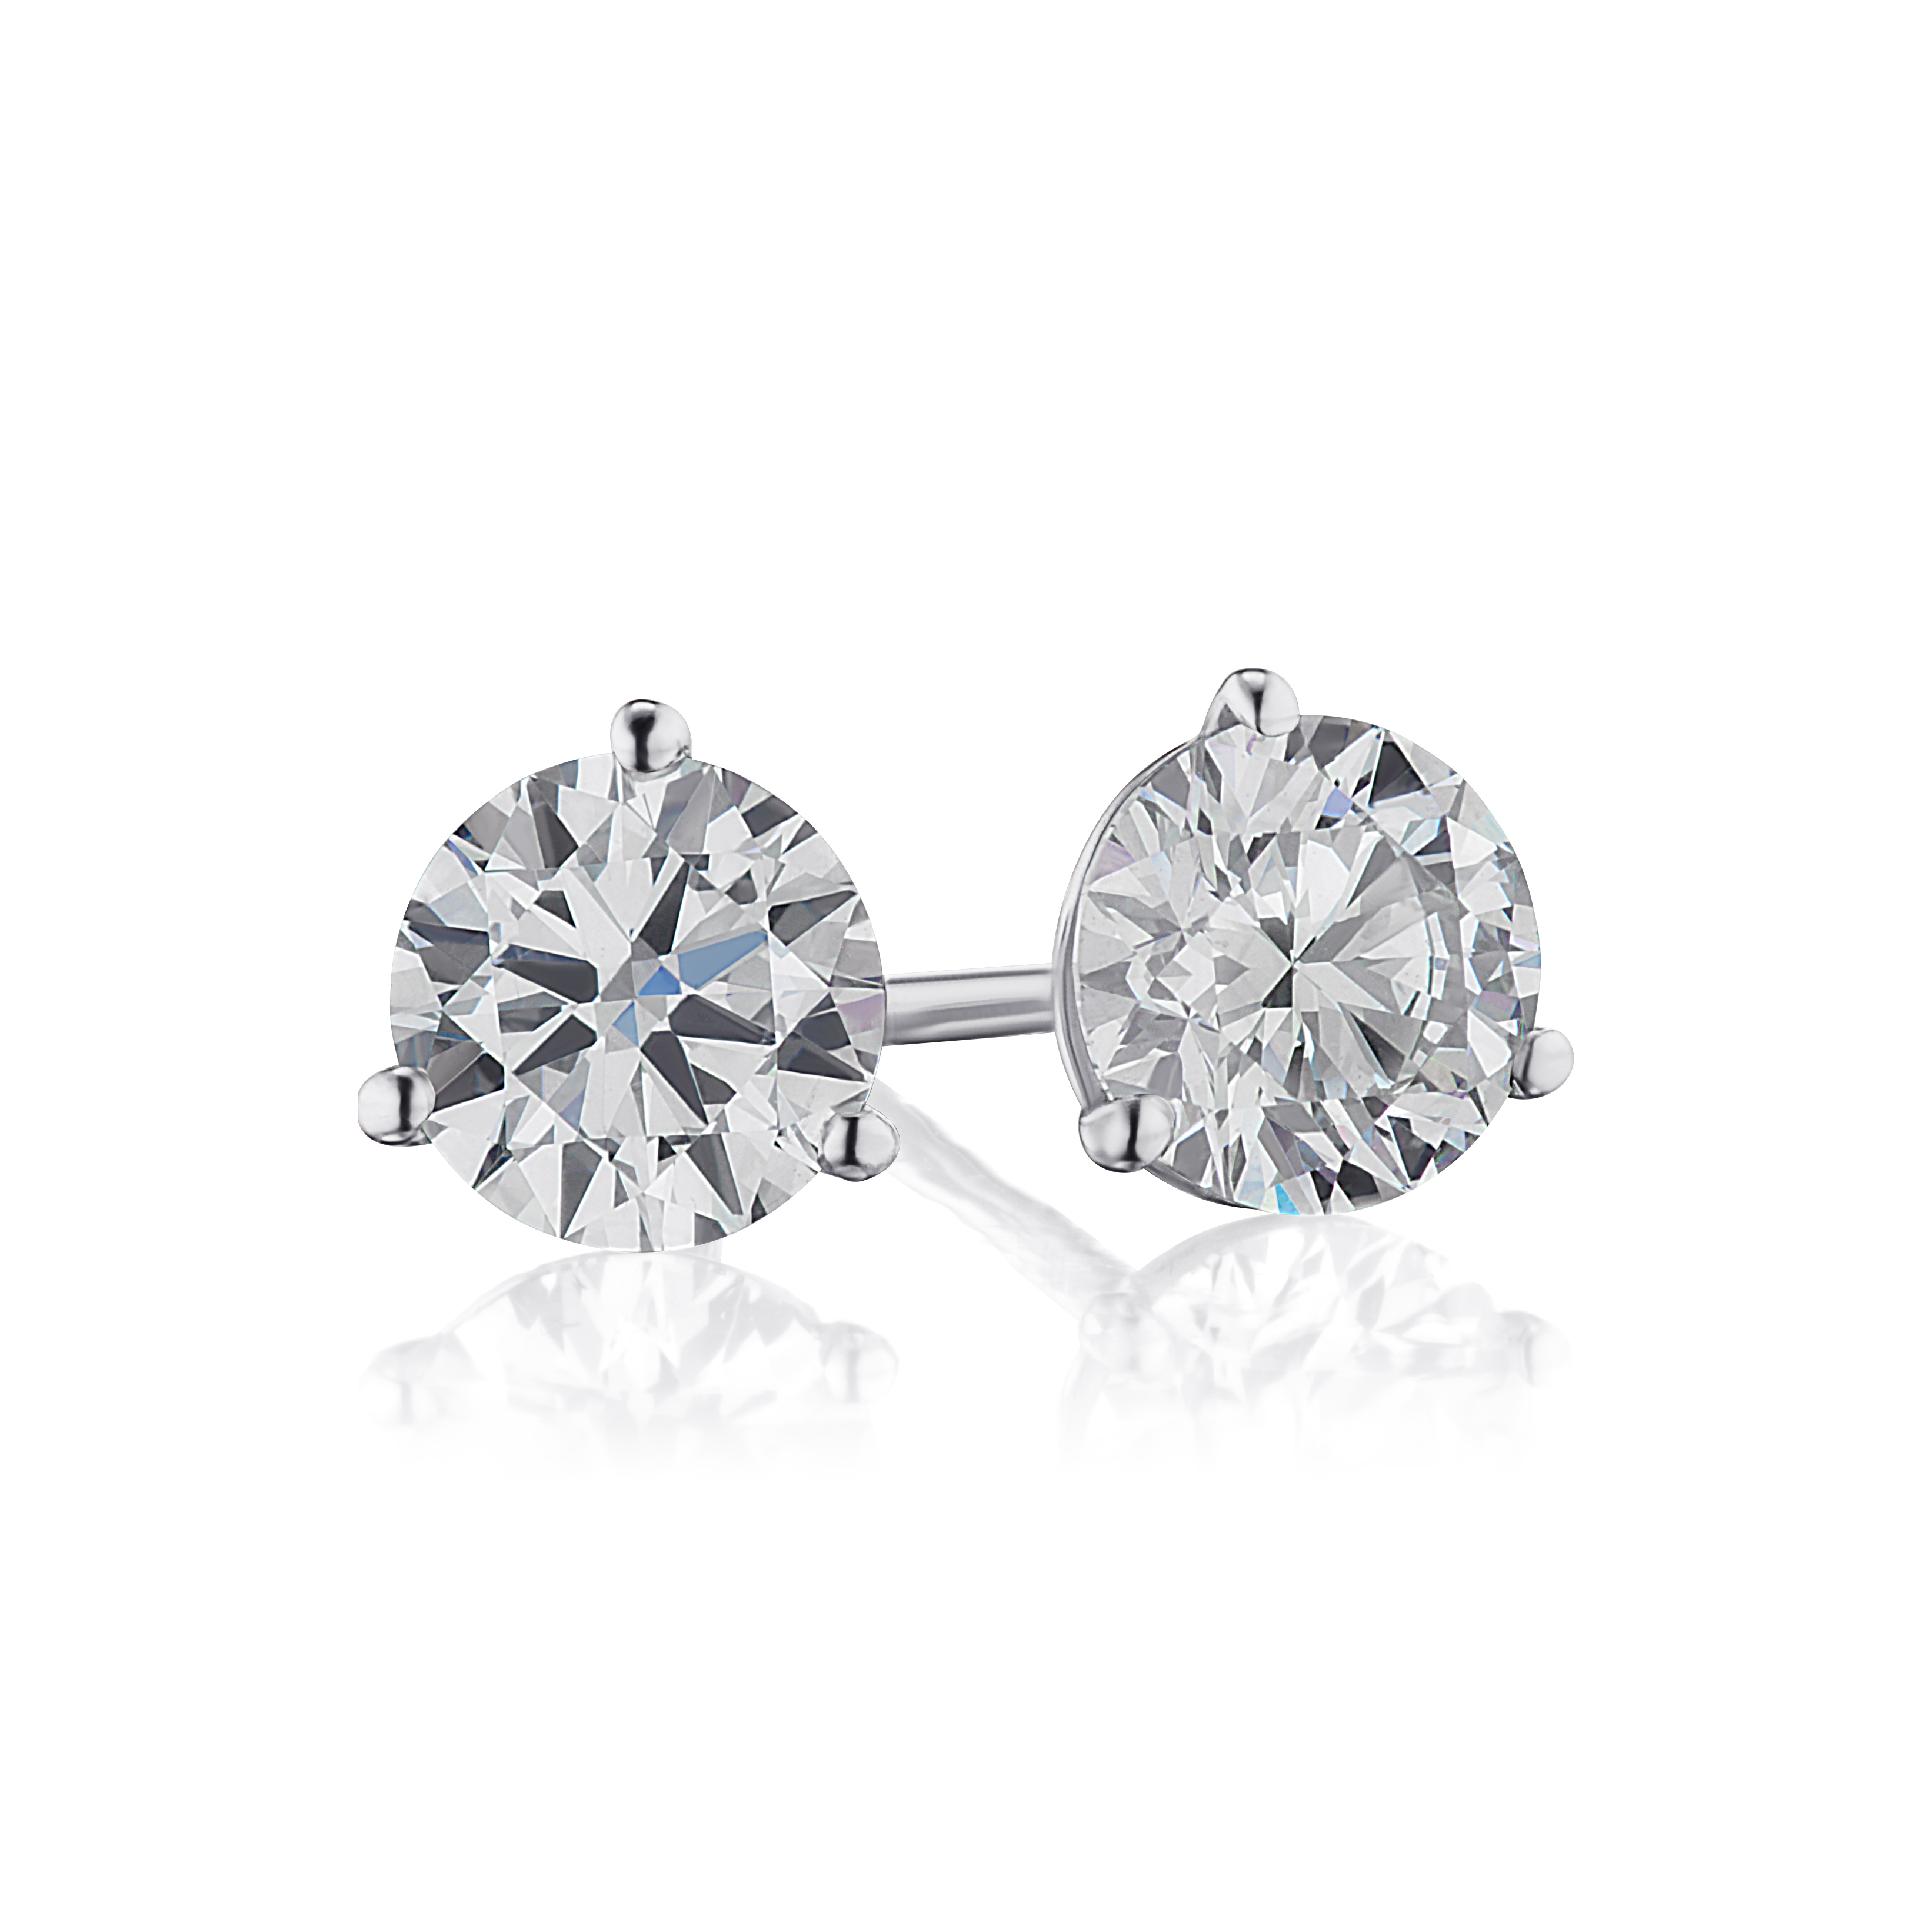 1.05ct. Diamond Studs